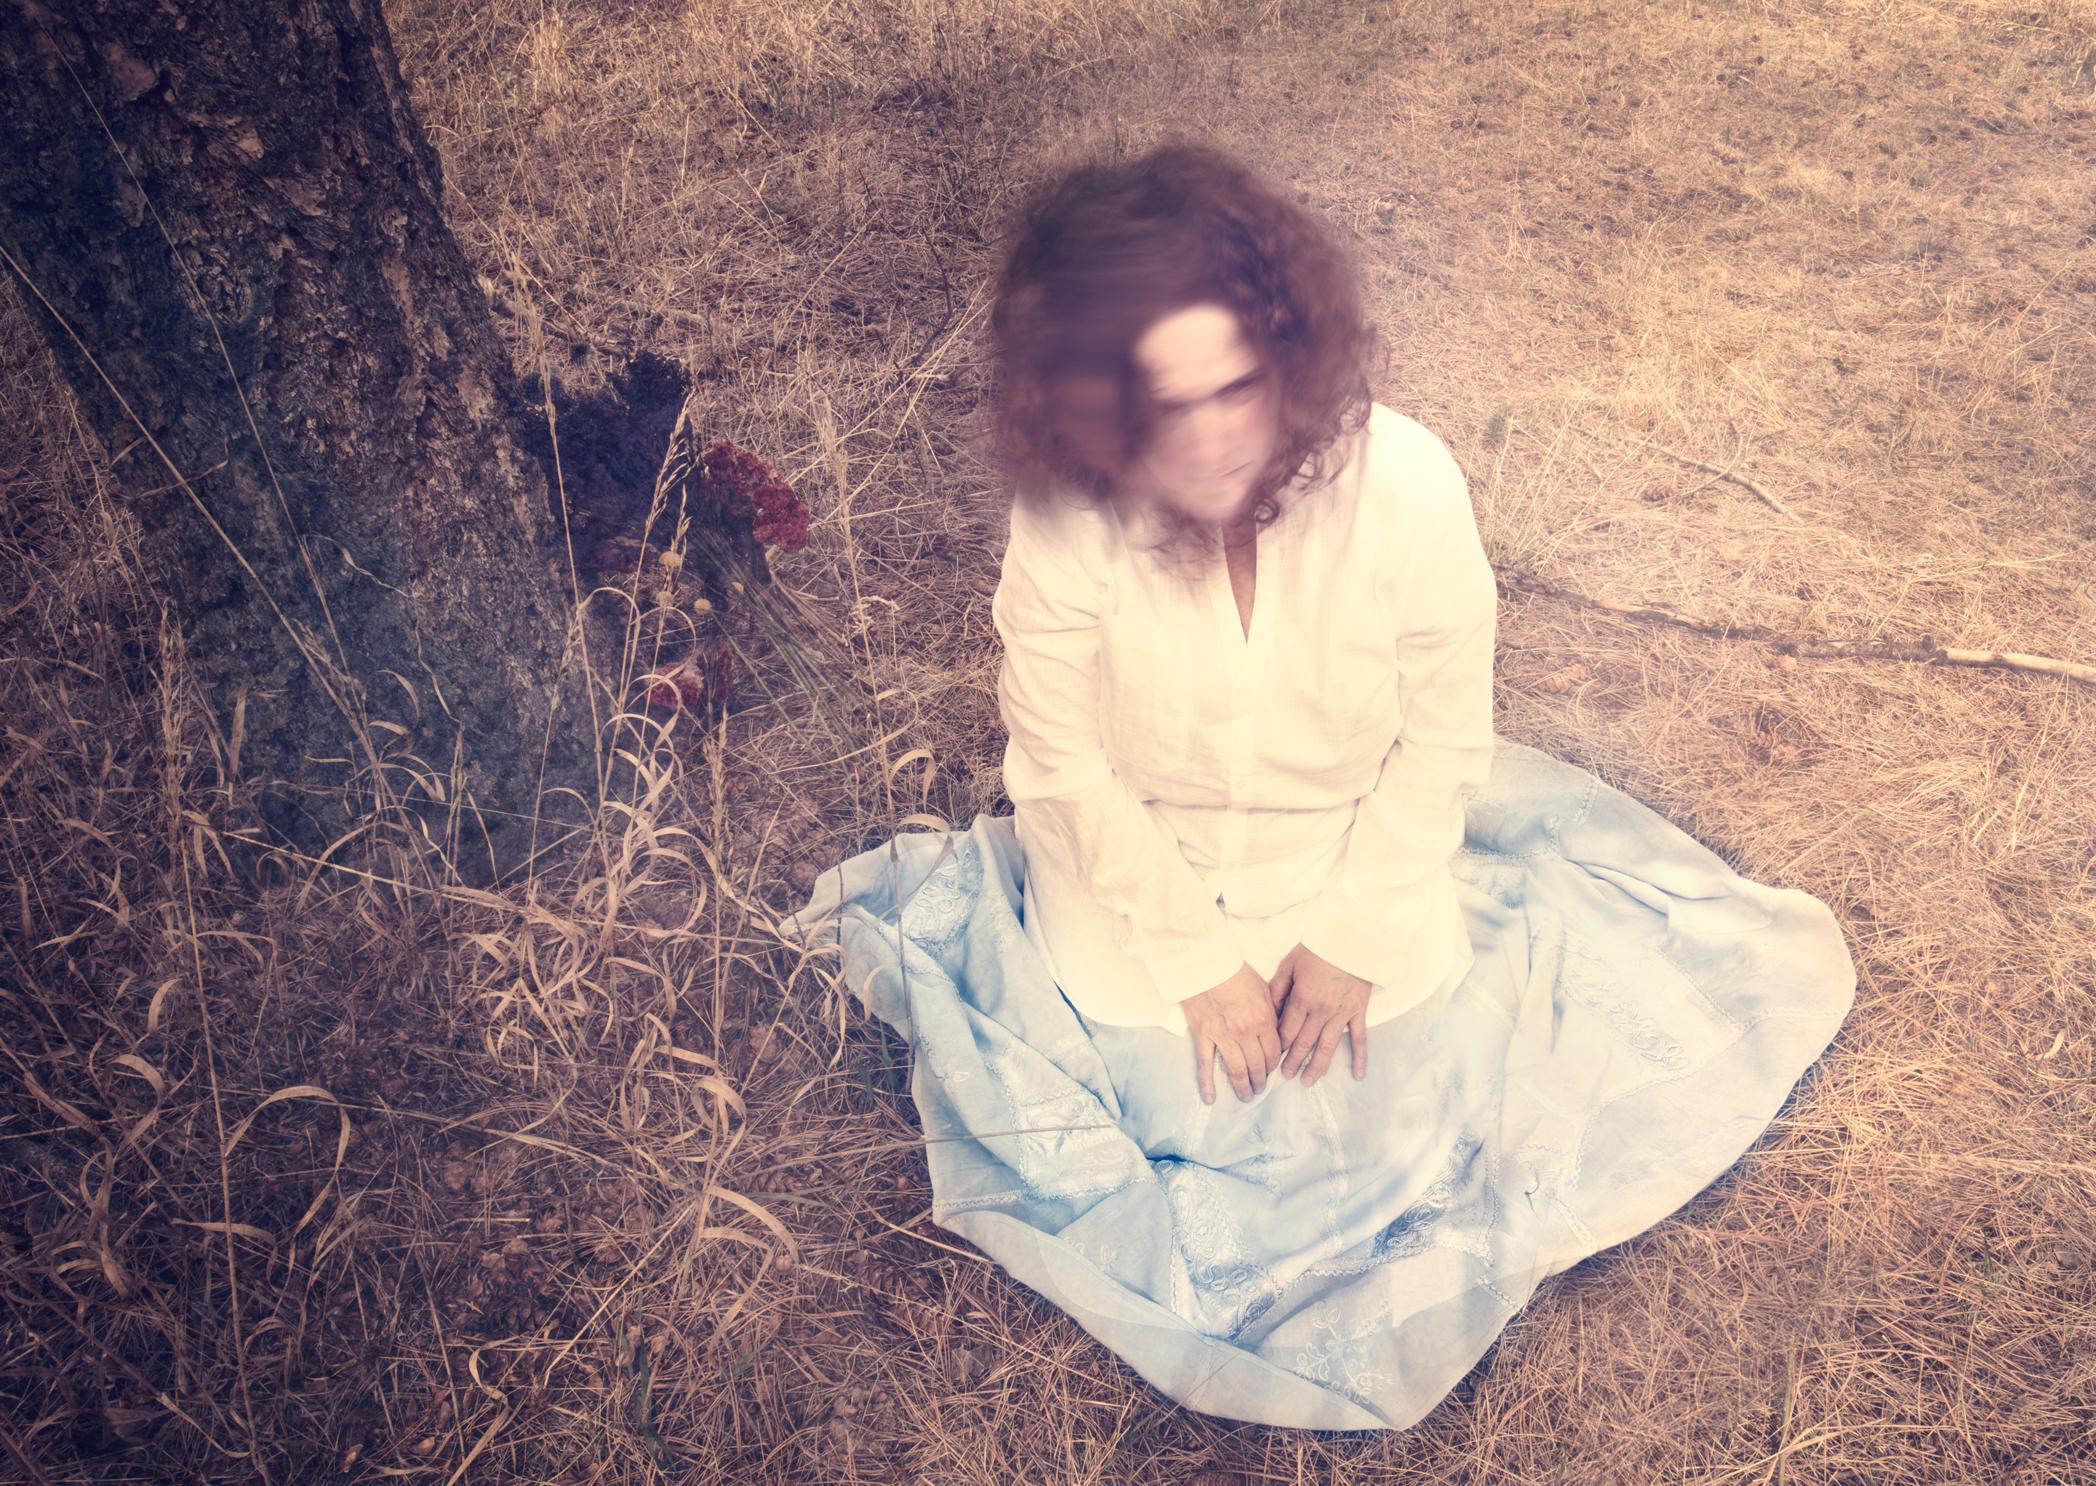 RPierce-Blurryface-2096.jpg